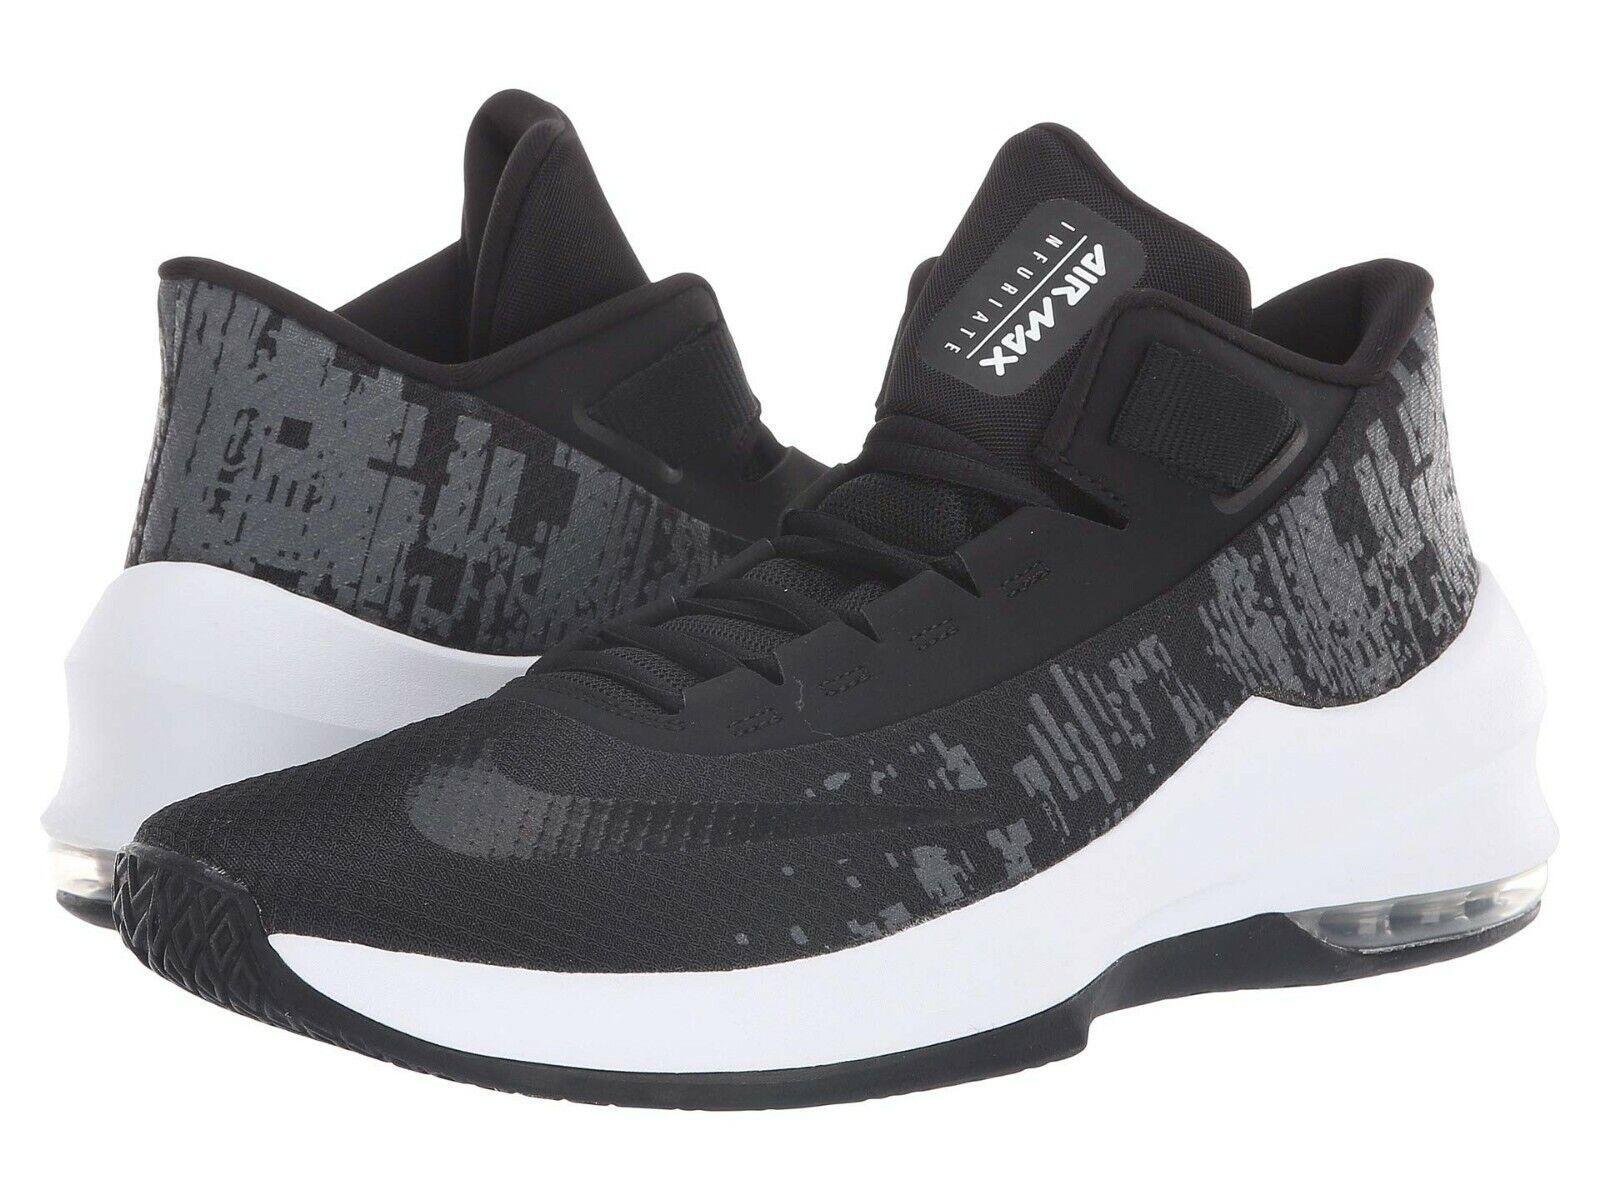 Nike AIR MAX INFURIATE 2 MID Mens Black Black-White-Anthracite AA7066-001 shoes